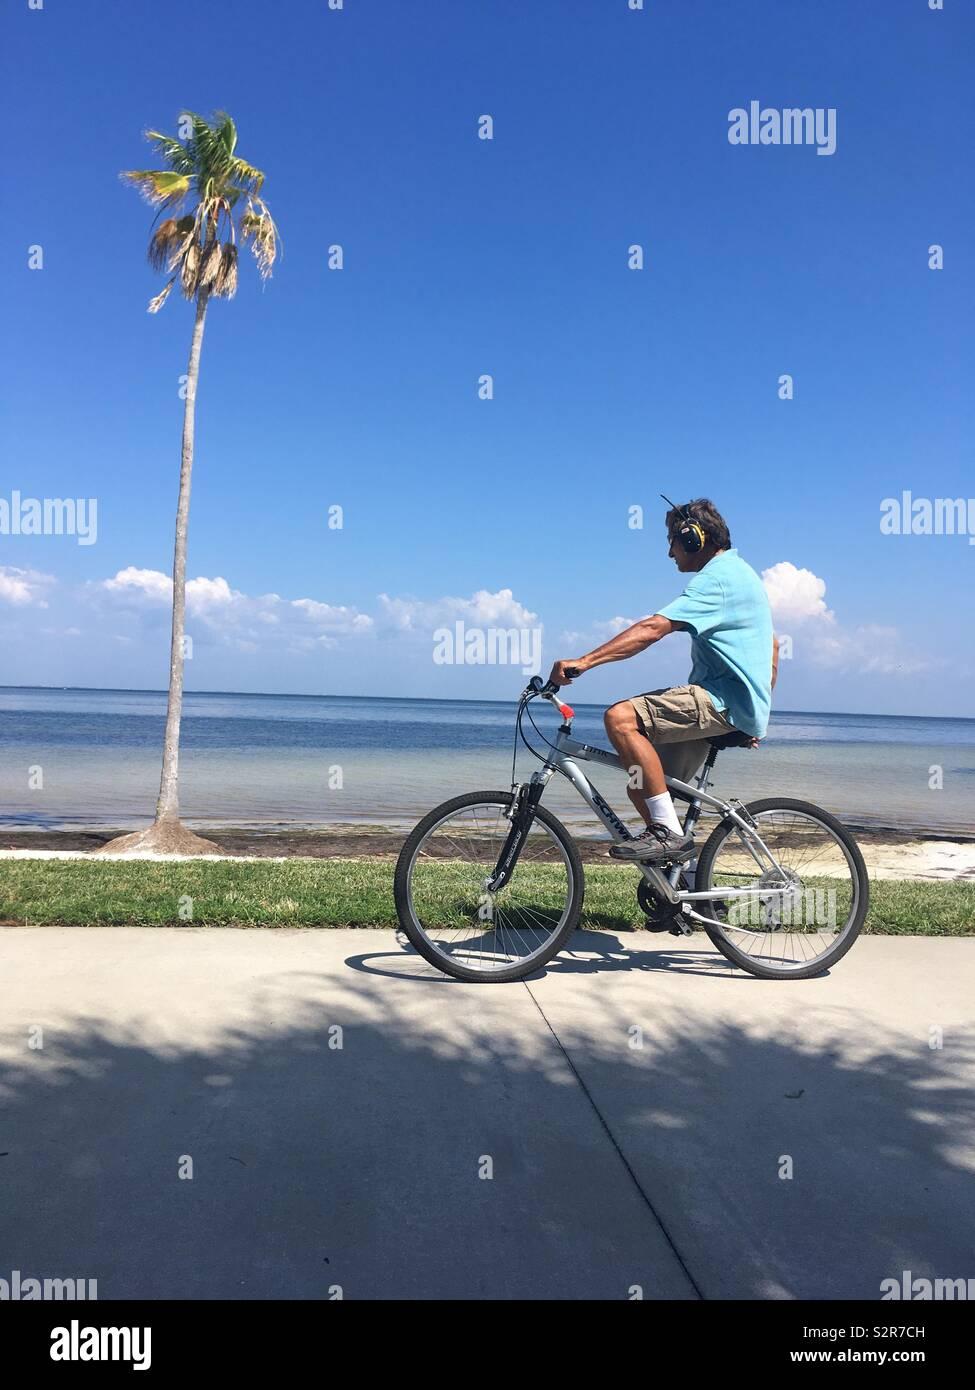 Man wearing headphones on bike cycling past palm tree - Stock Image